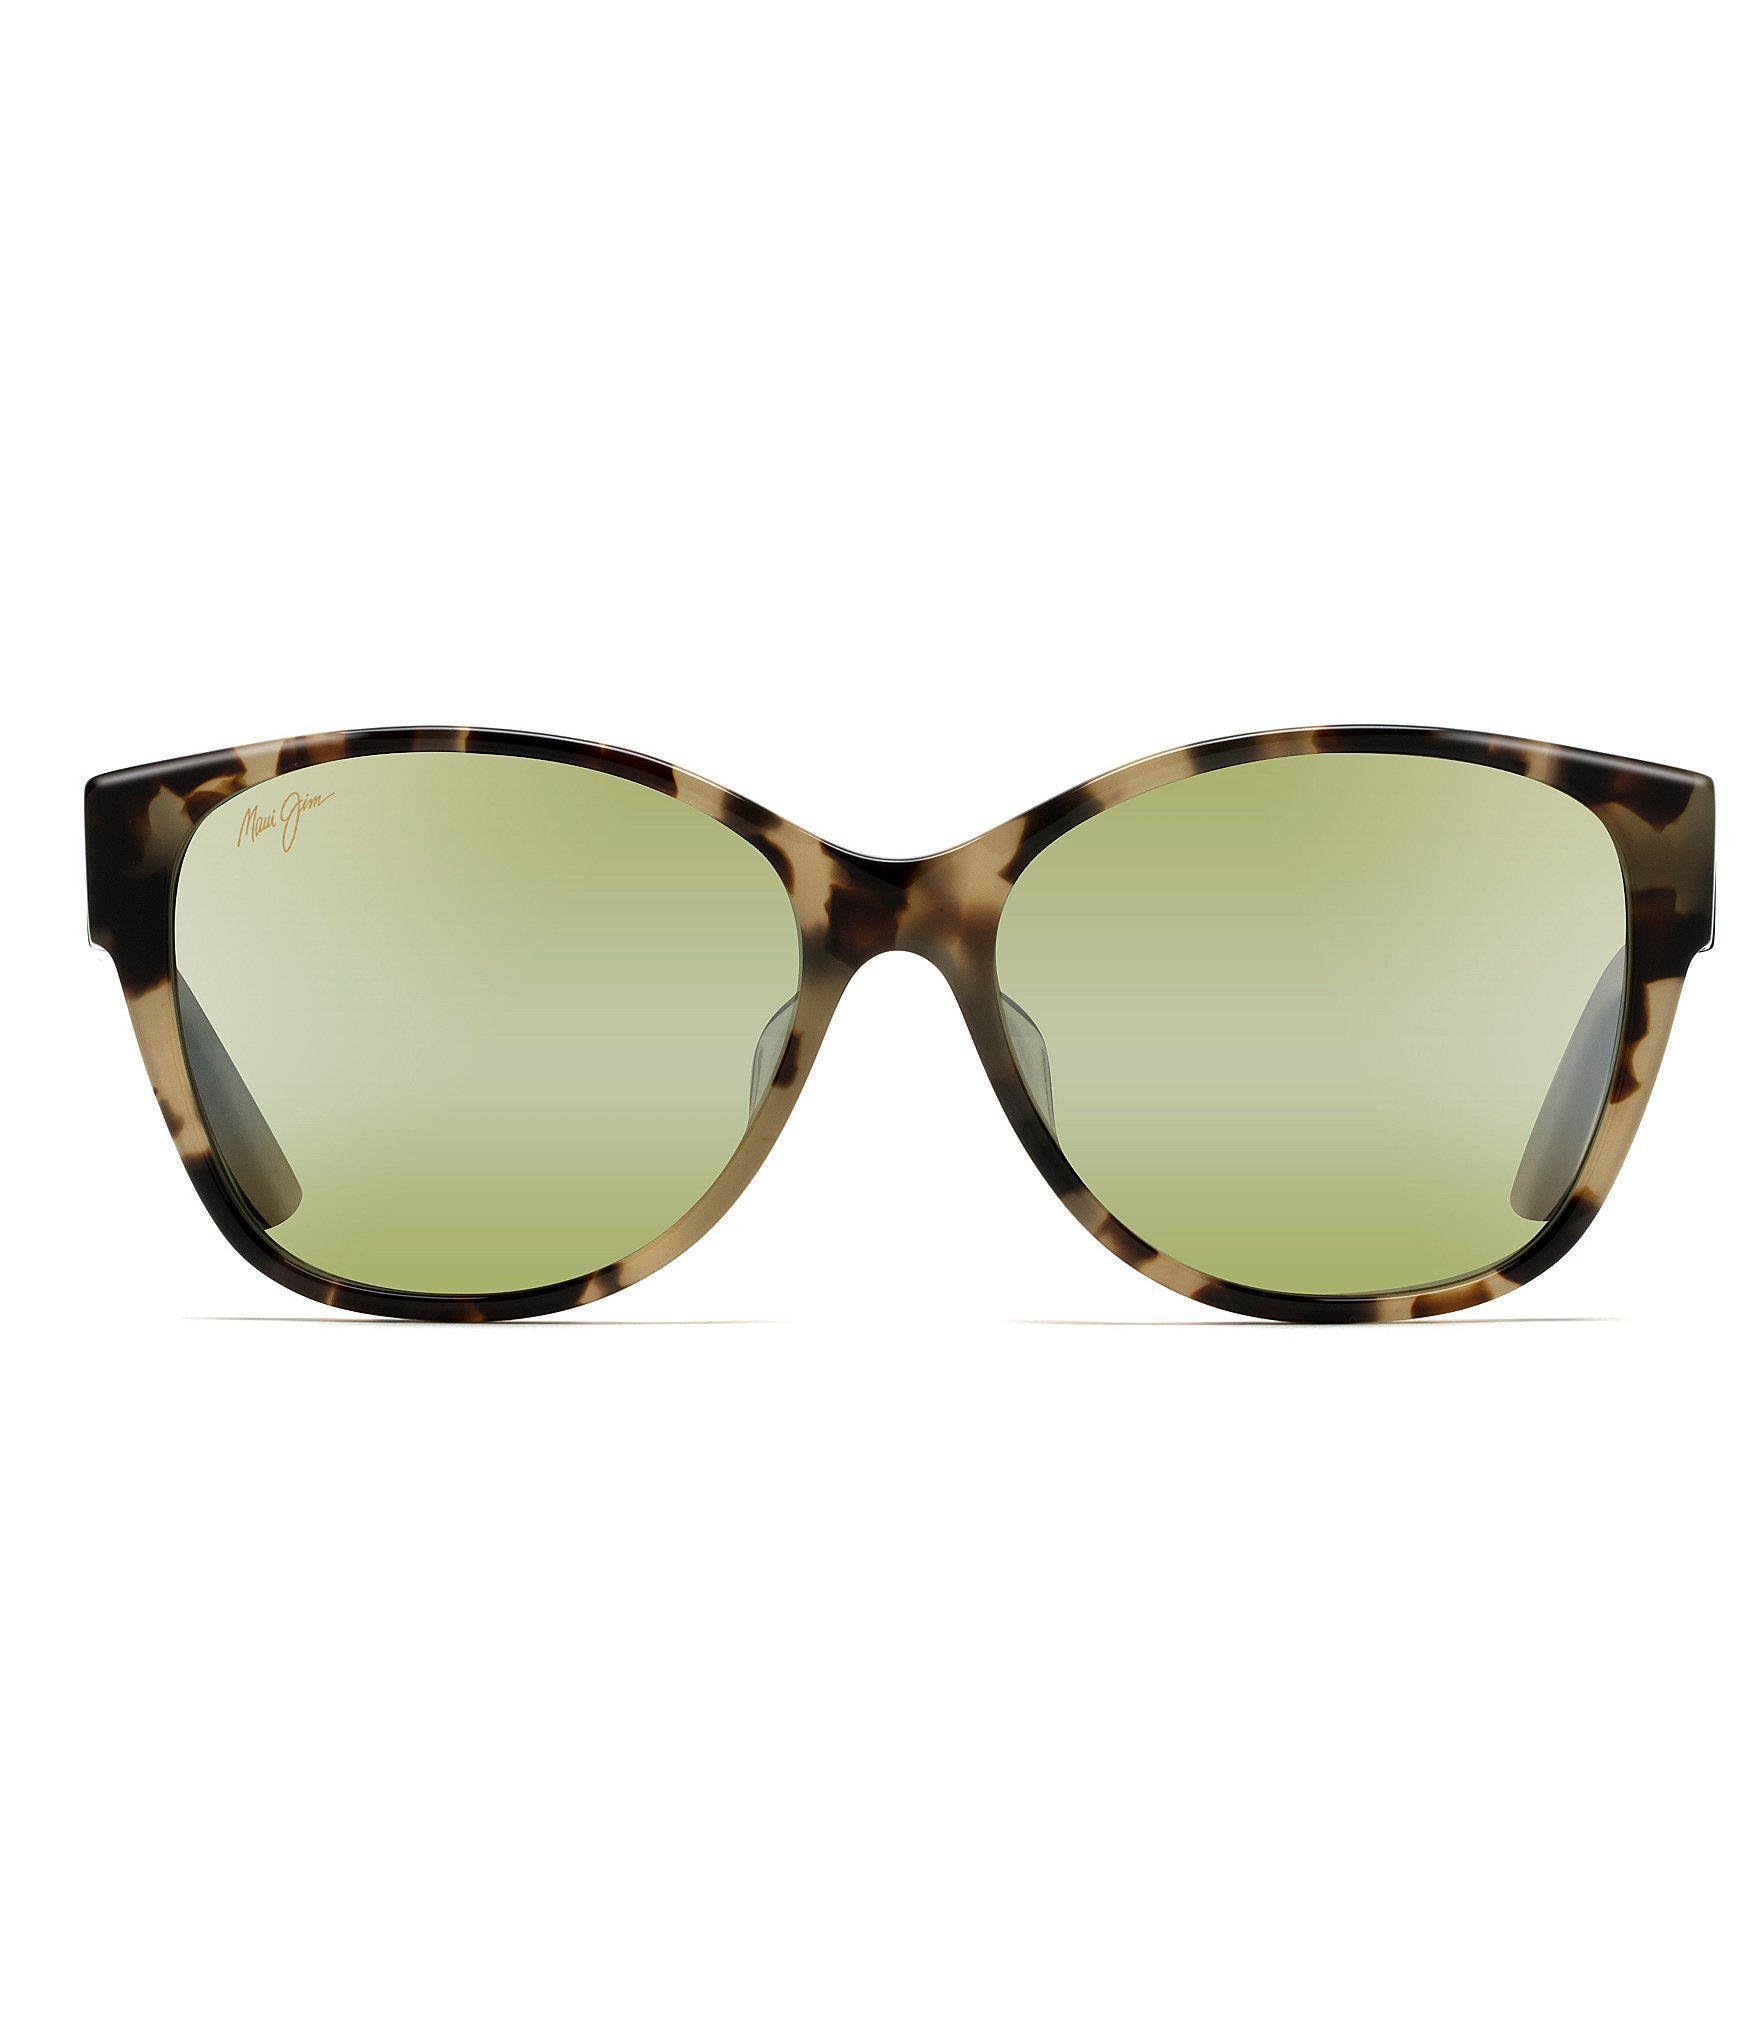 26f5514549c Maui Jim - Green Summer Time Polarized Gradient Sunglasses - Lyst. View  fullscreen